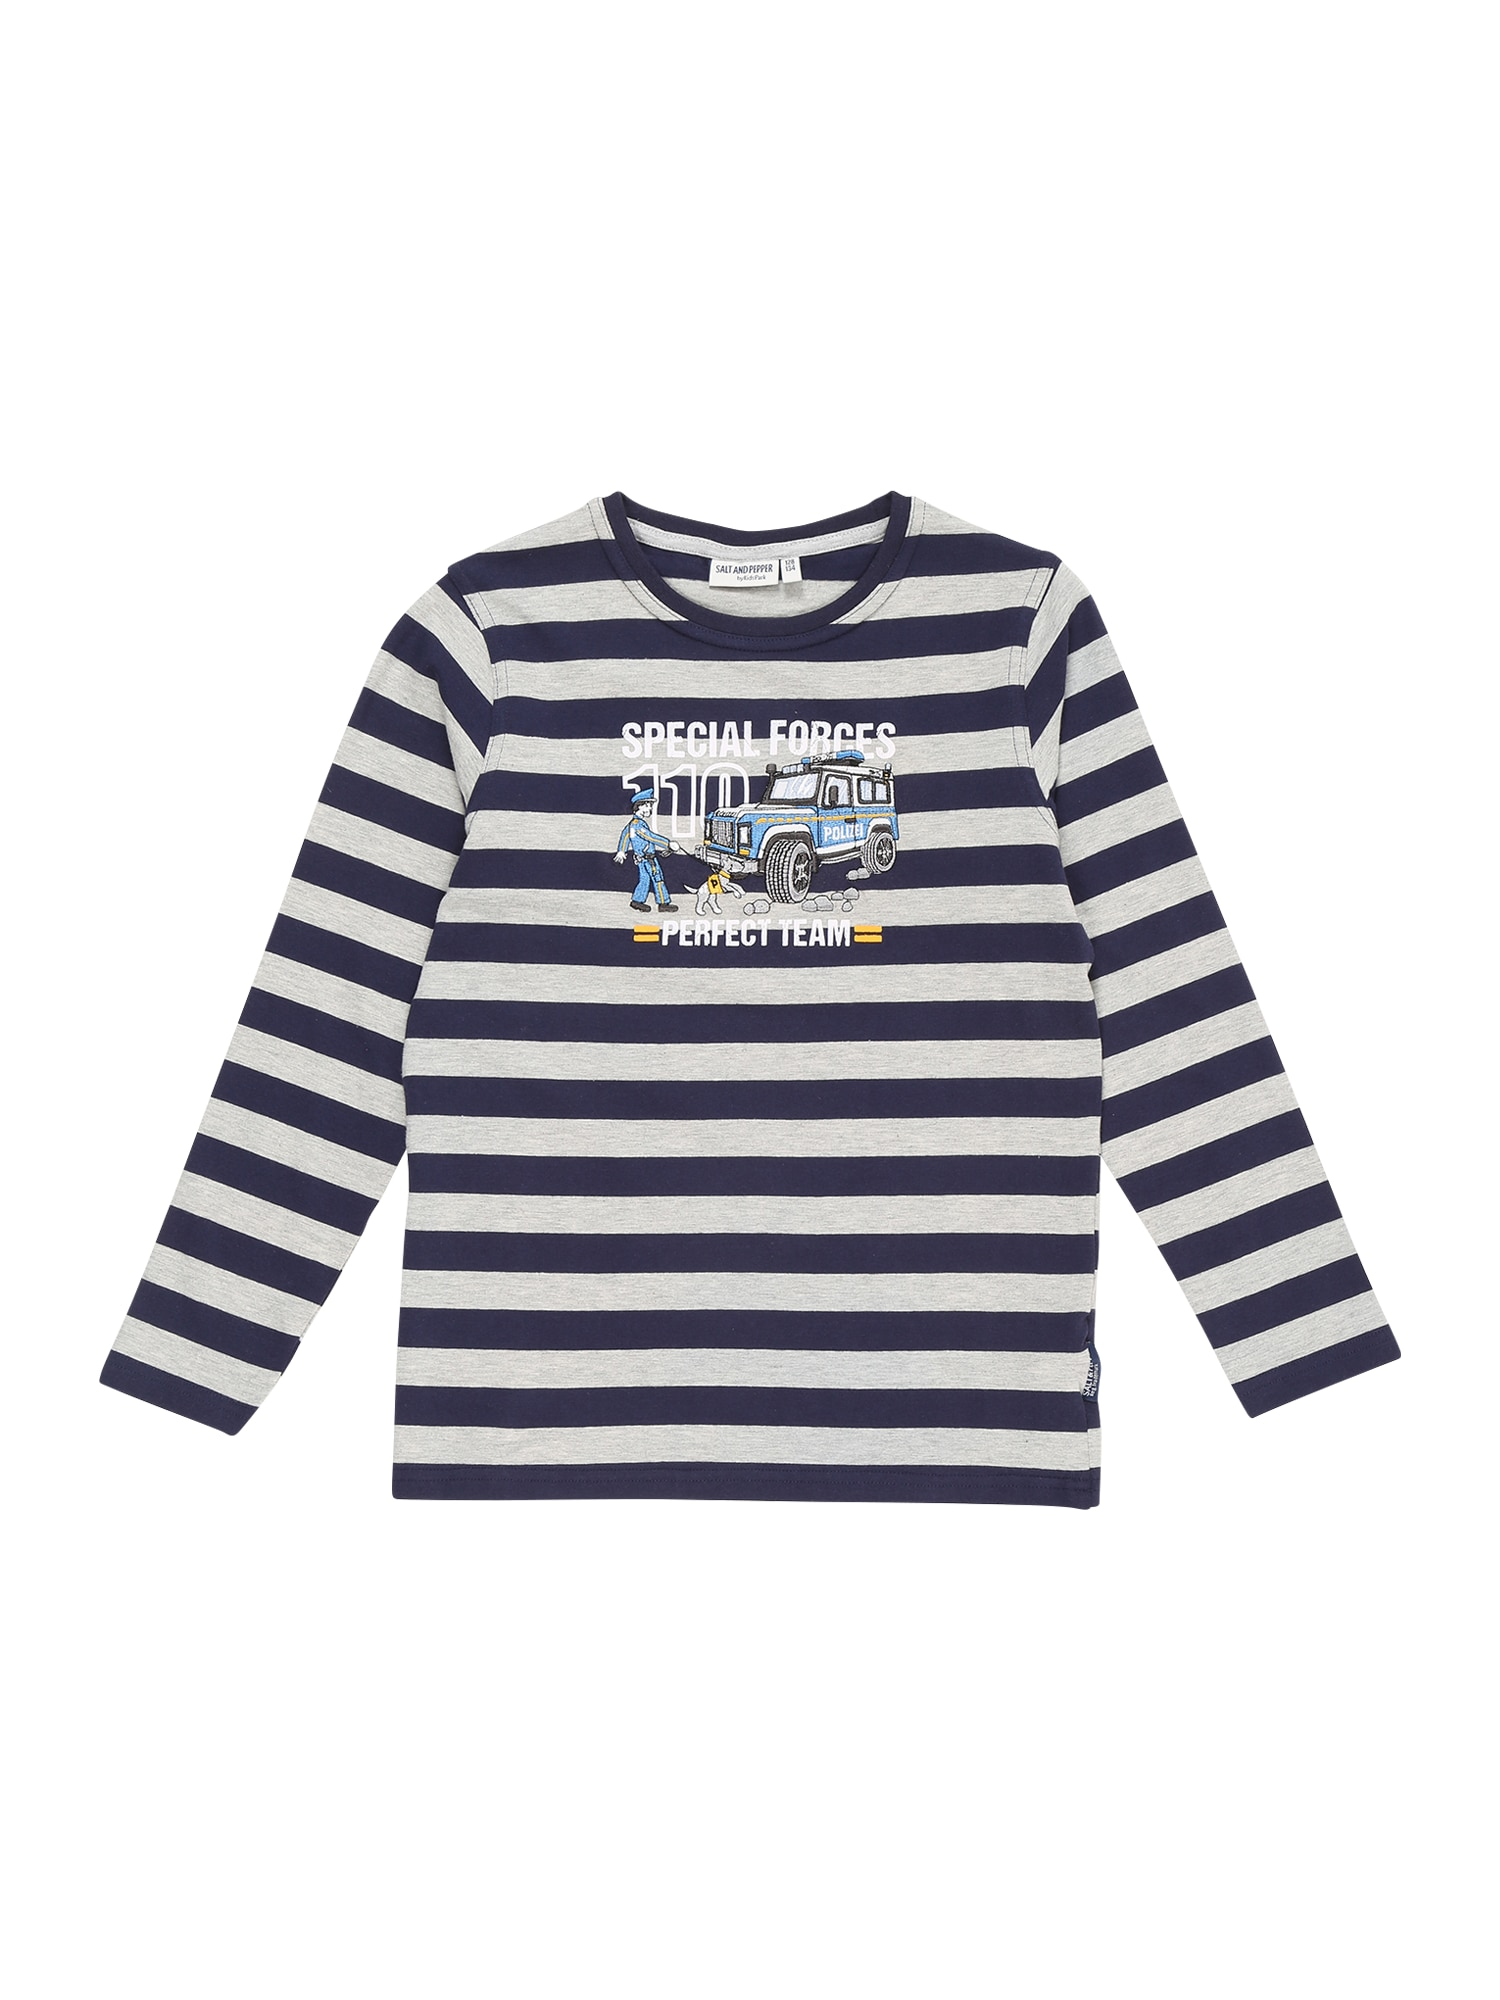 SALT AND PEPPER Marškinėliai tamsiai mėlyna / šviesiai mėlyna